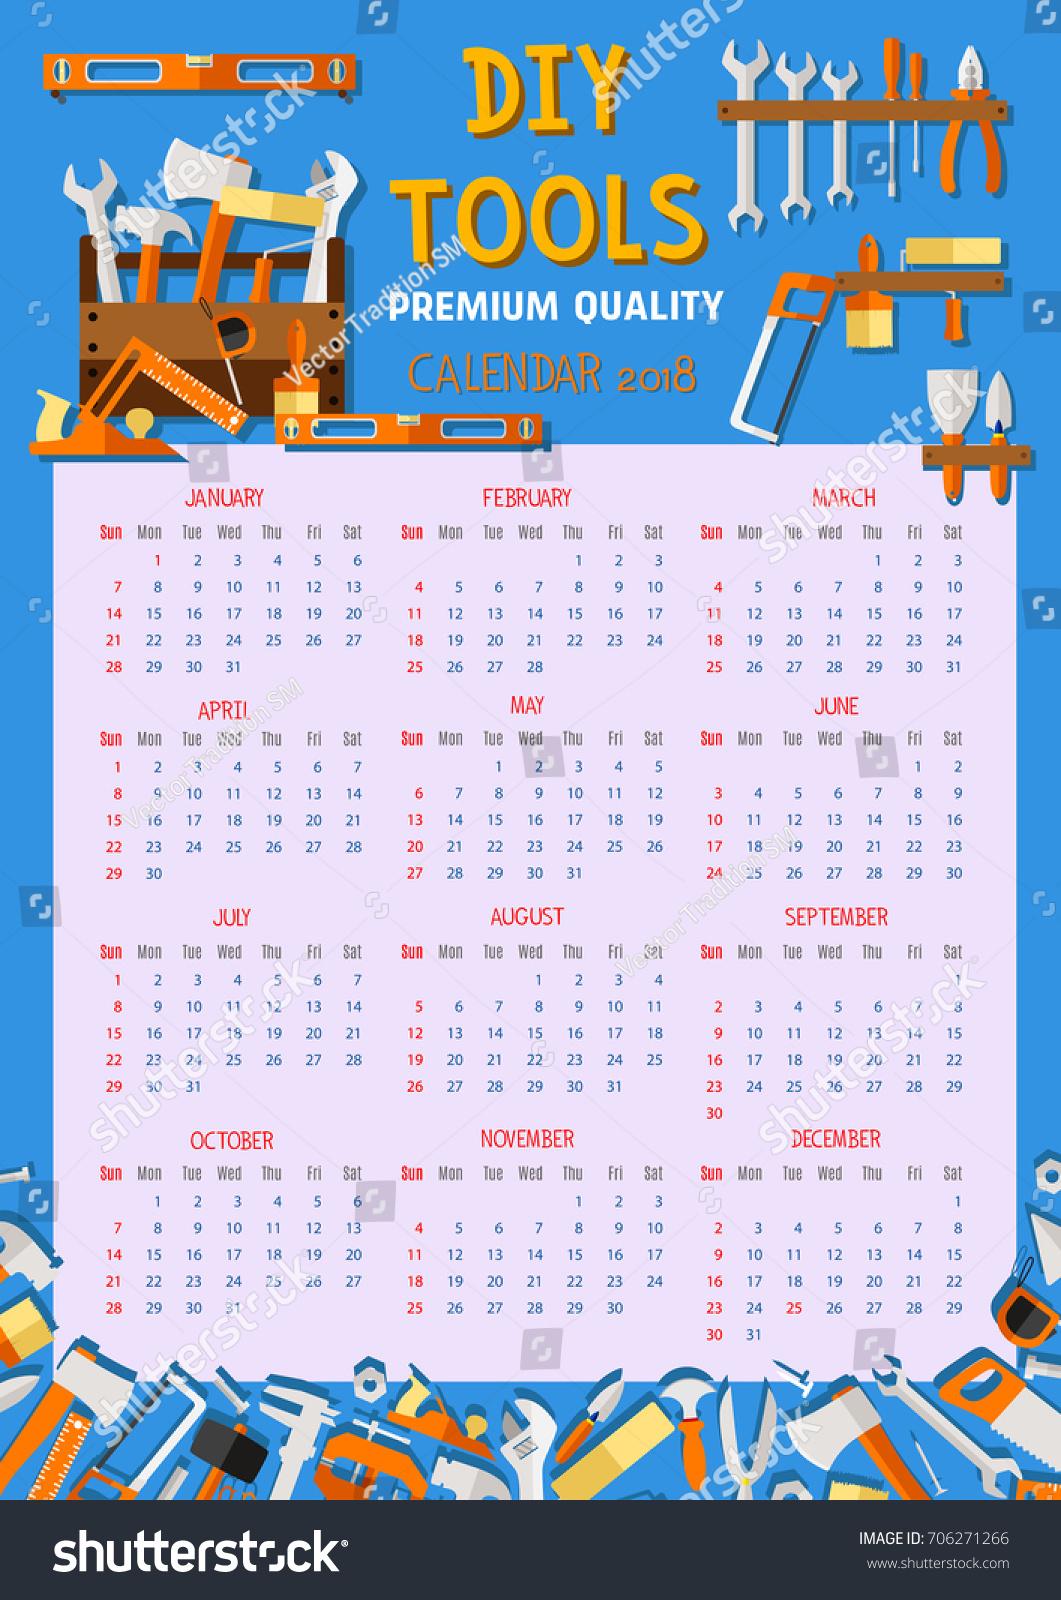 Calendar Design Diy : Personalized calendar idea sarah titus